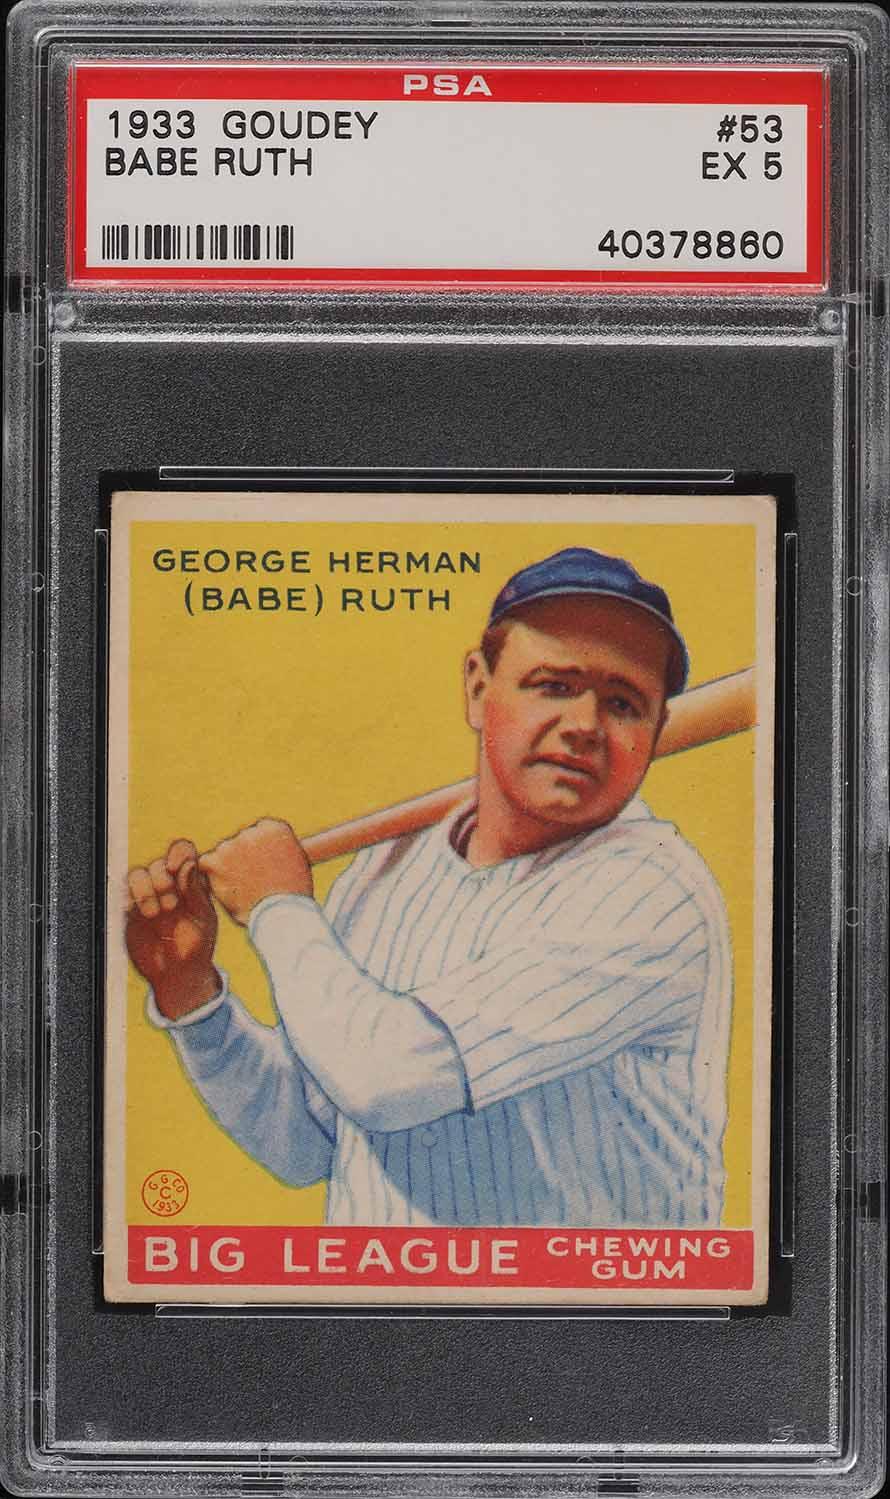 1933 Goudey Babe Ruth #53 PSA 5 EX (PWCC-A) - Image 1